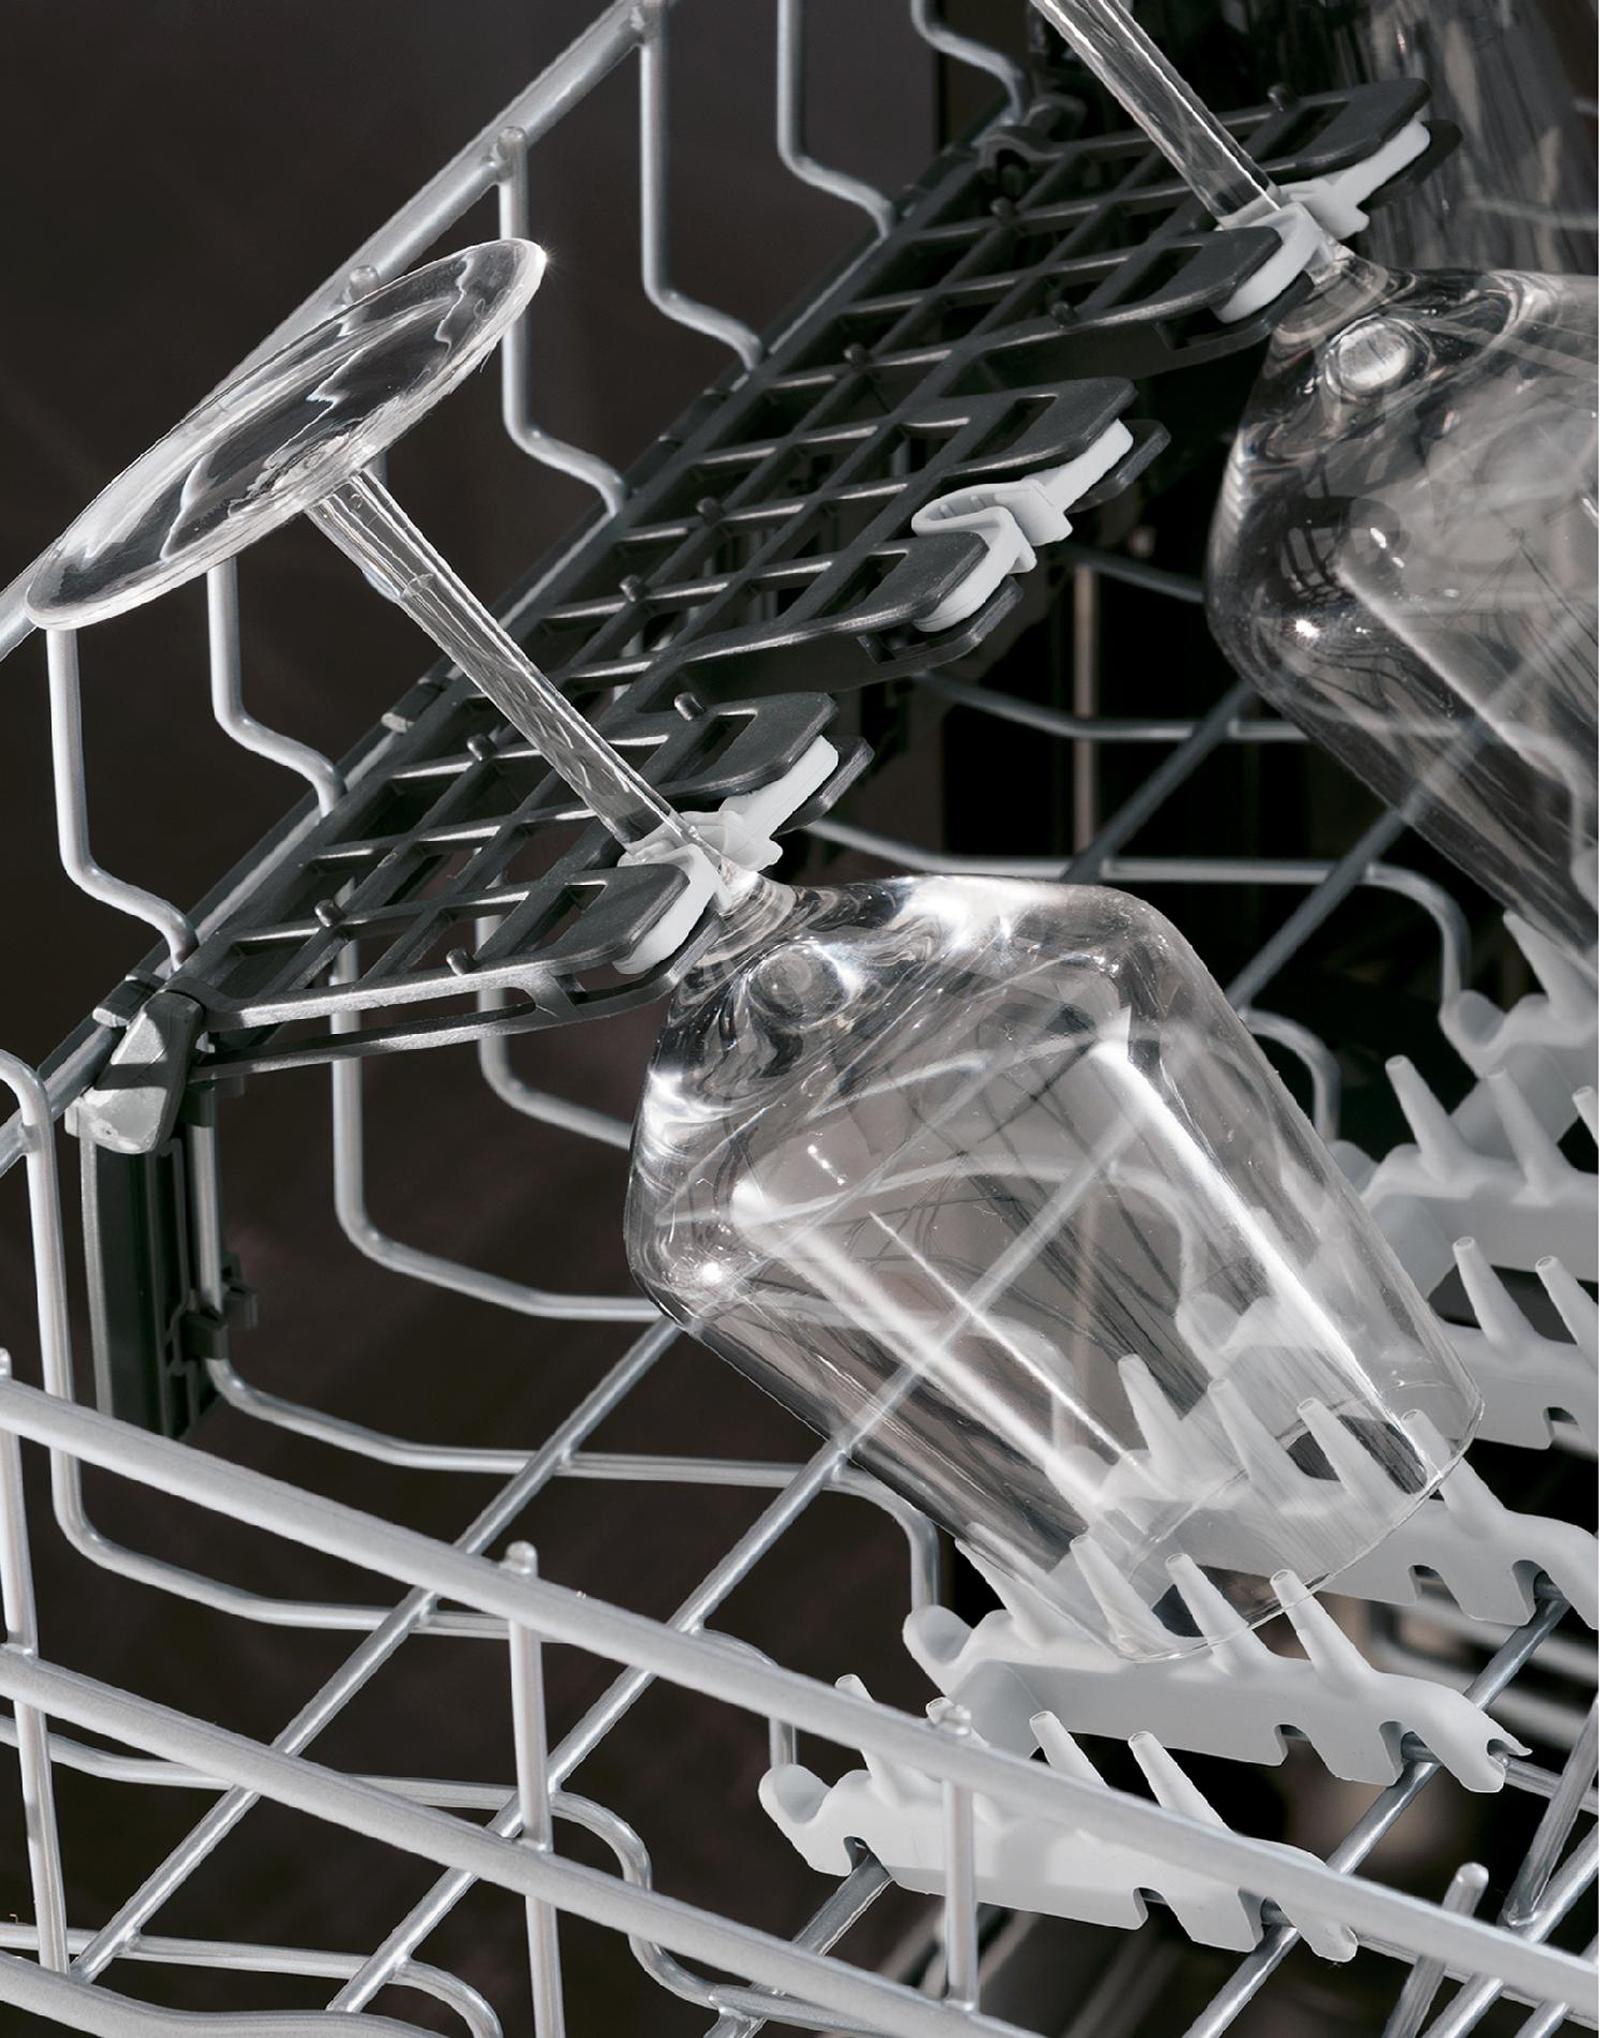 "Frigidaire 24"" Professional Built-In Dishwasher w/ Orbit Clean Wash Arm - Stainless Steel"